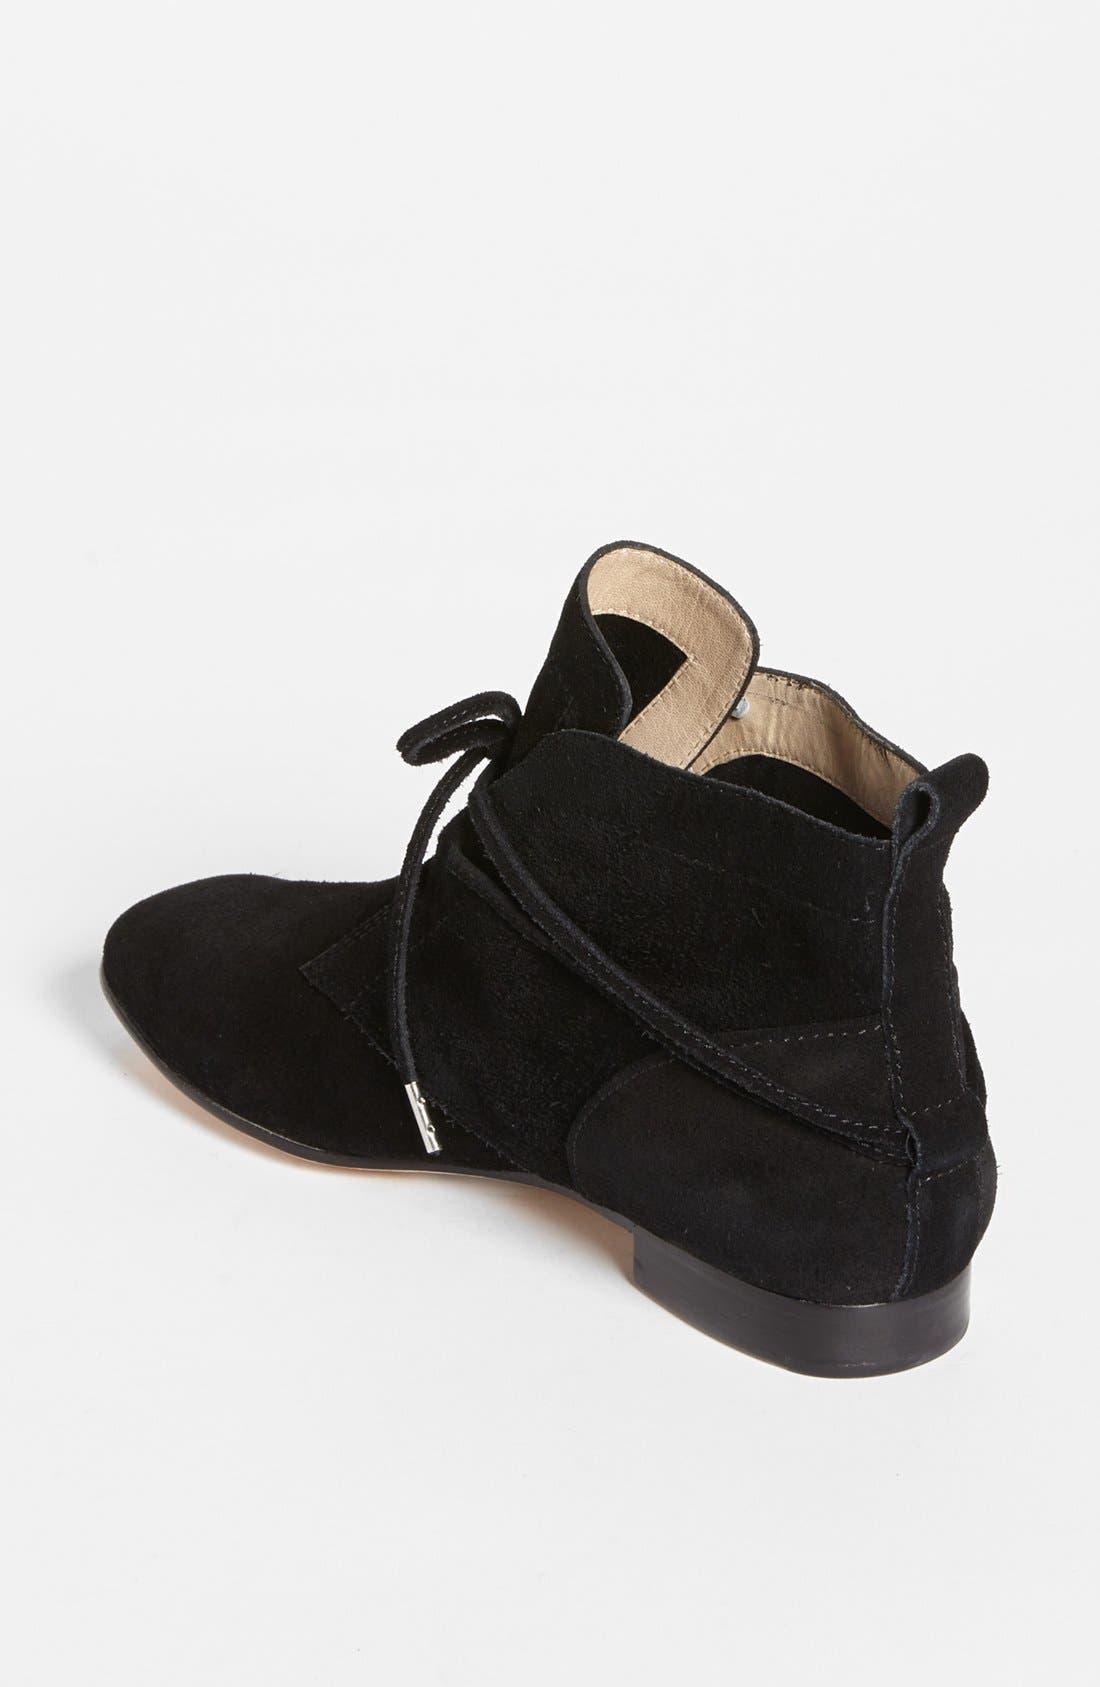 'Camo' Boot,                             Alternate thumbnail 3, color,                             006